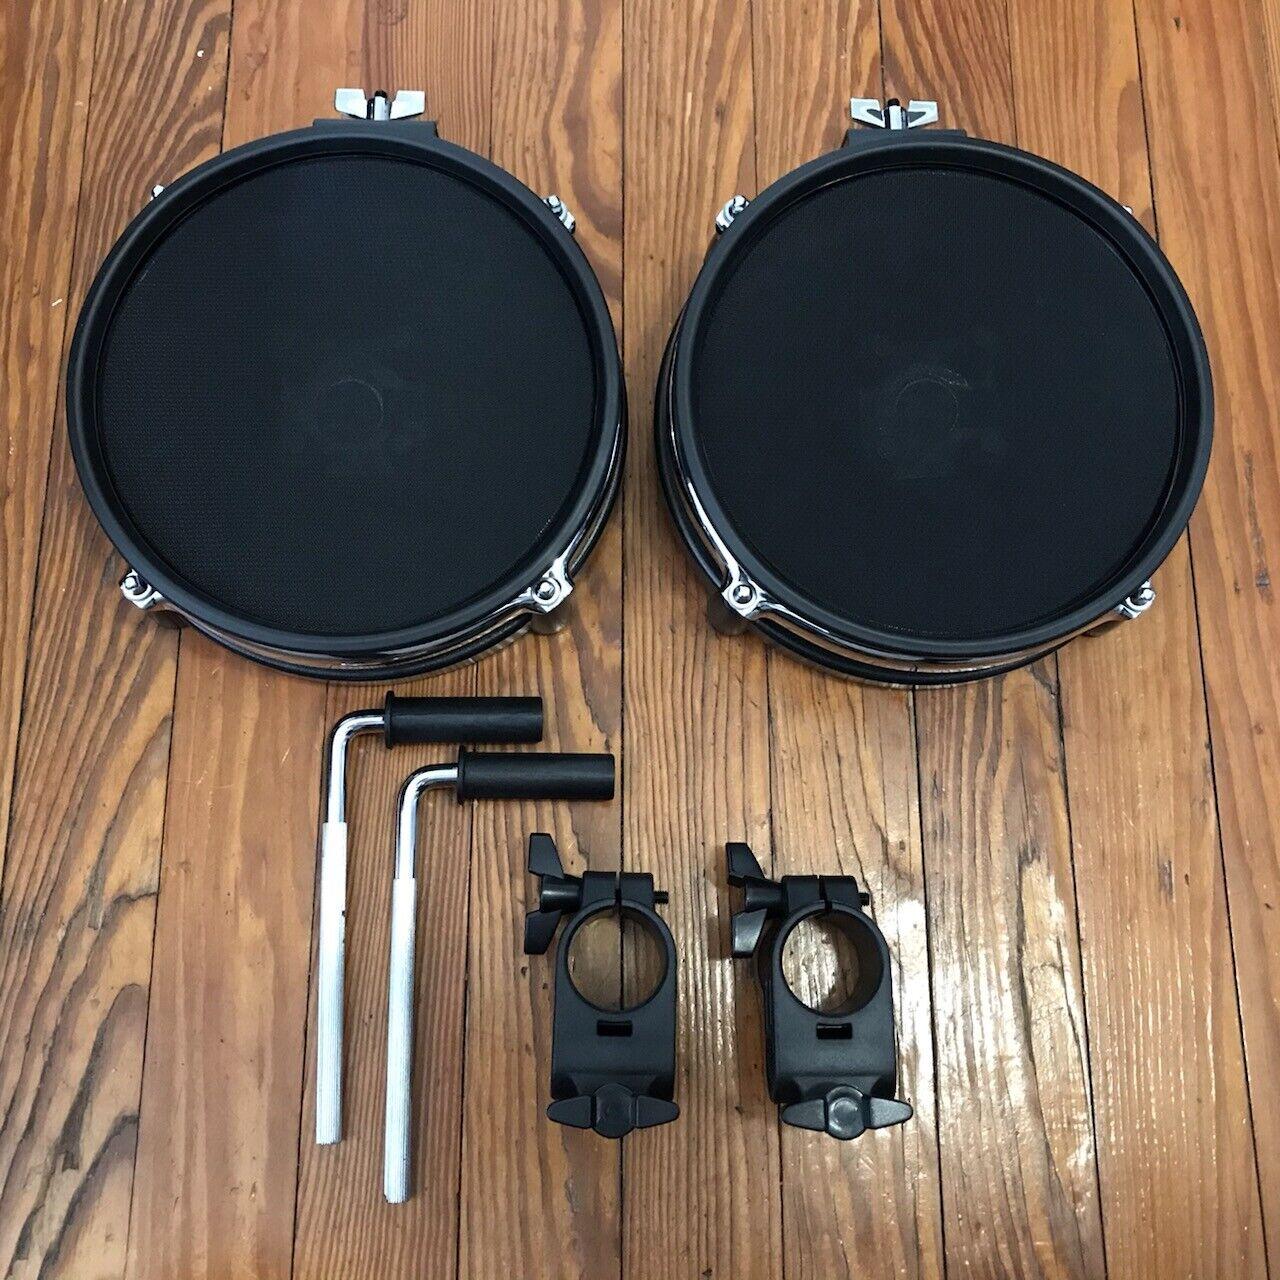 Lot of 2 Alesis 8  Mesh Drum Pads Dual Zone Surge (Mounts Optional) Kit Snare